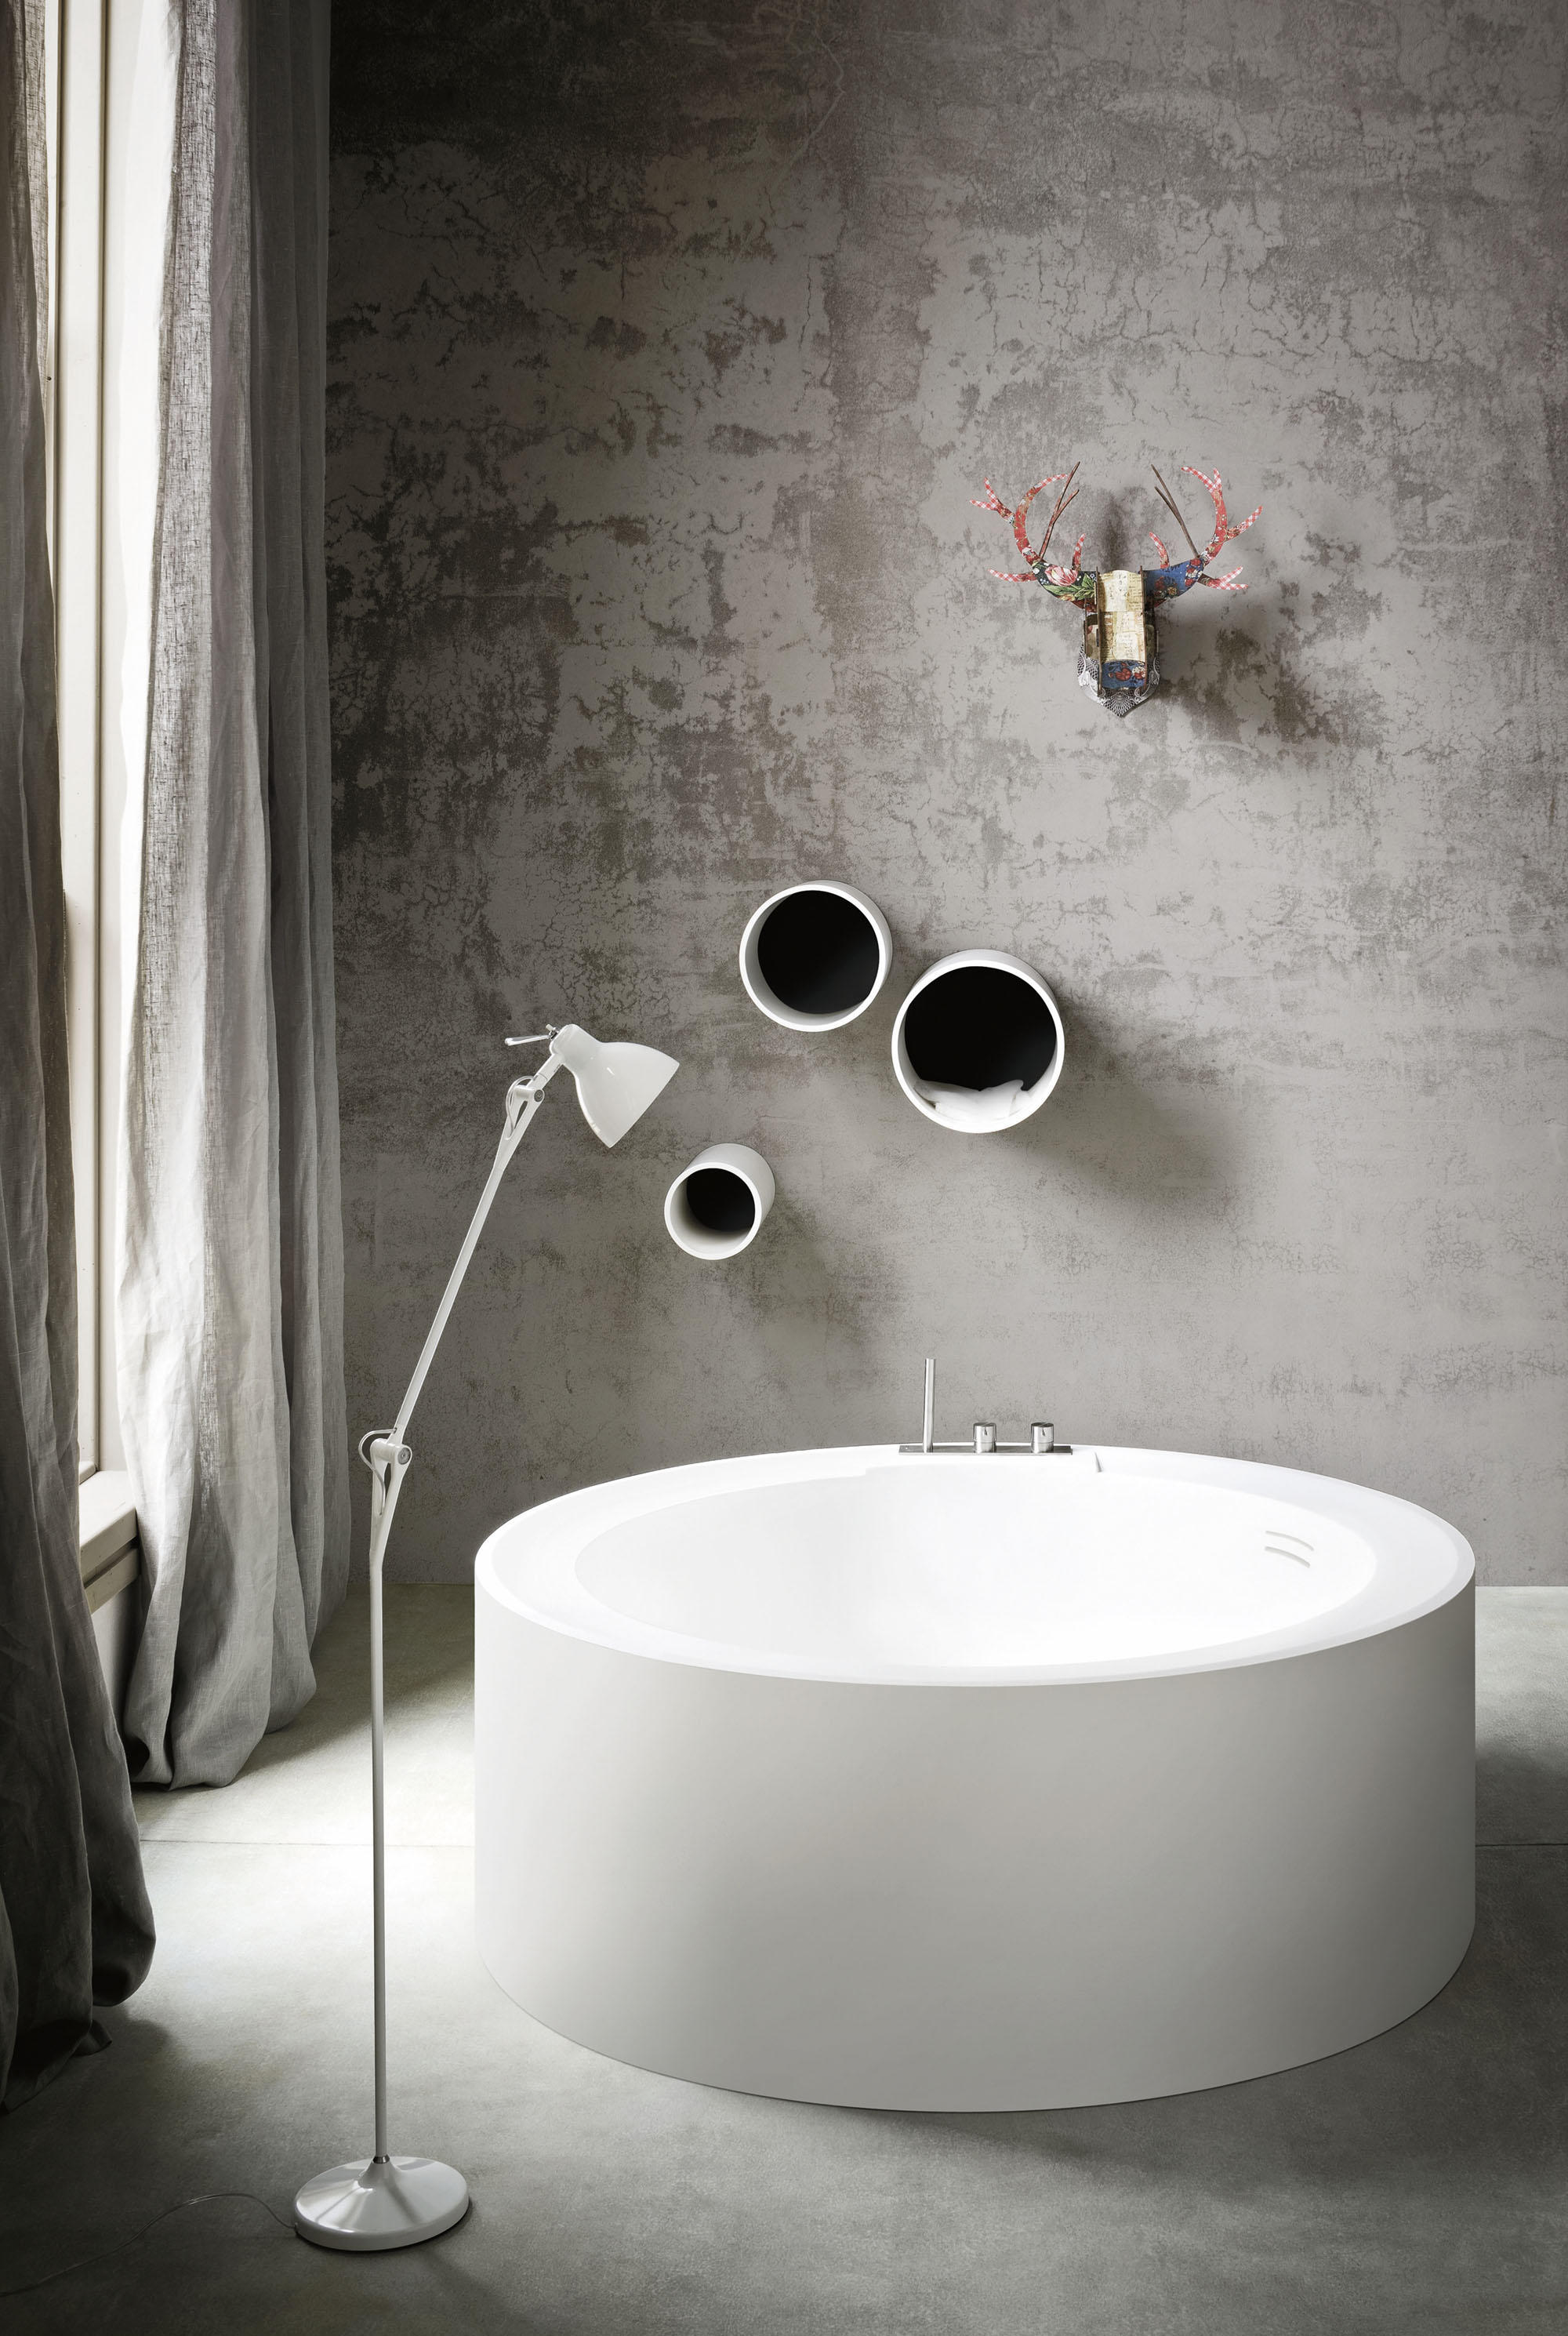 bathtubs round  high quality designer bathtubs round  architonic - hole bathtub  freestanding baths  rexa design